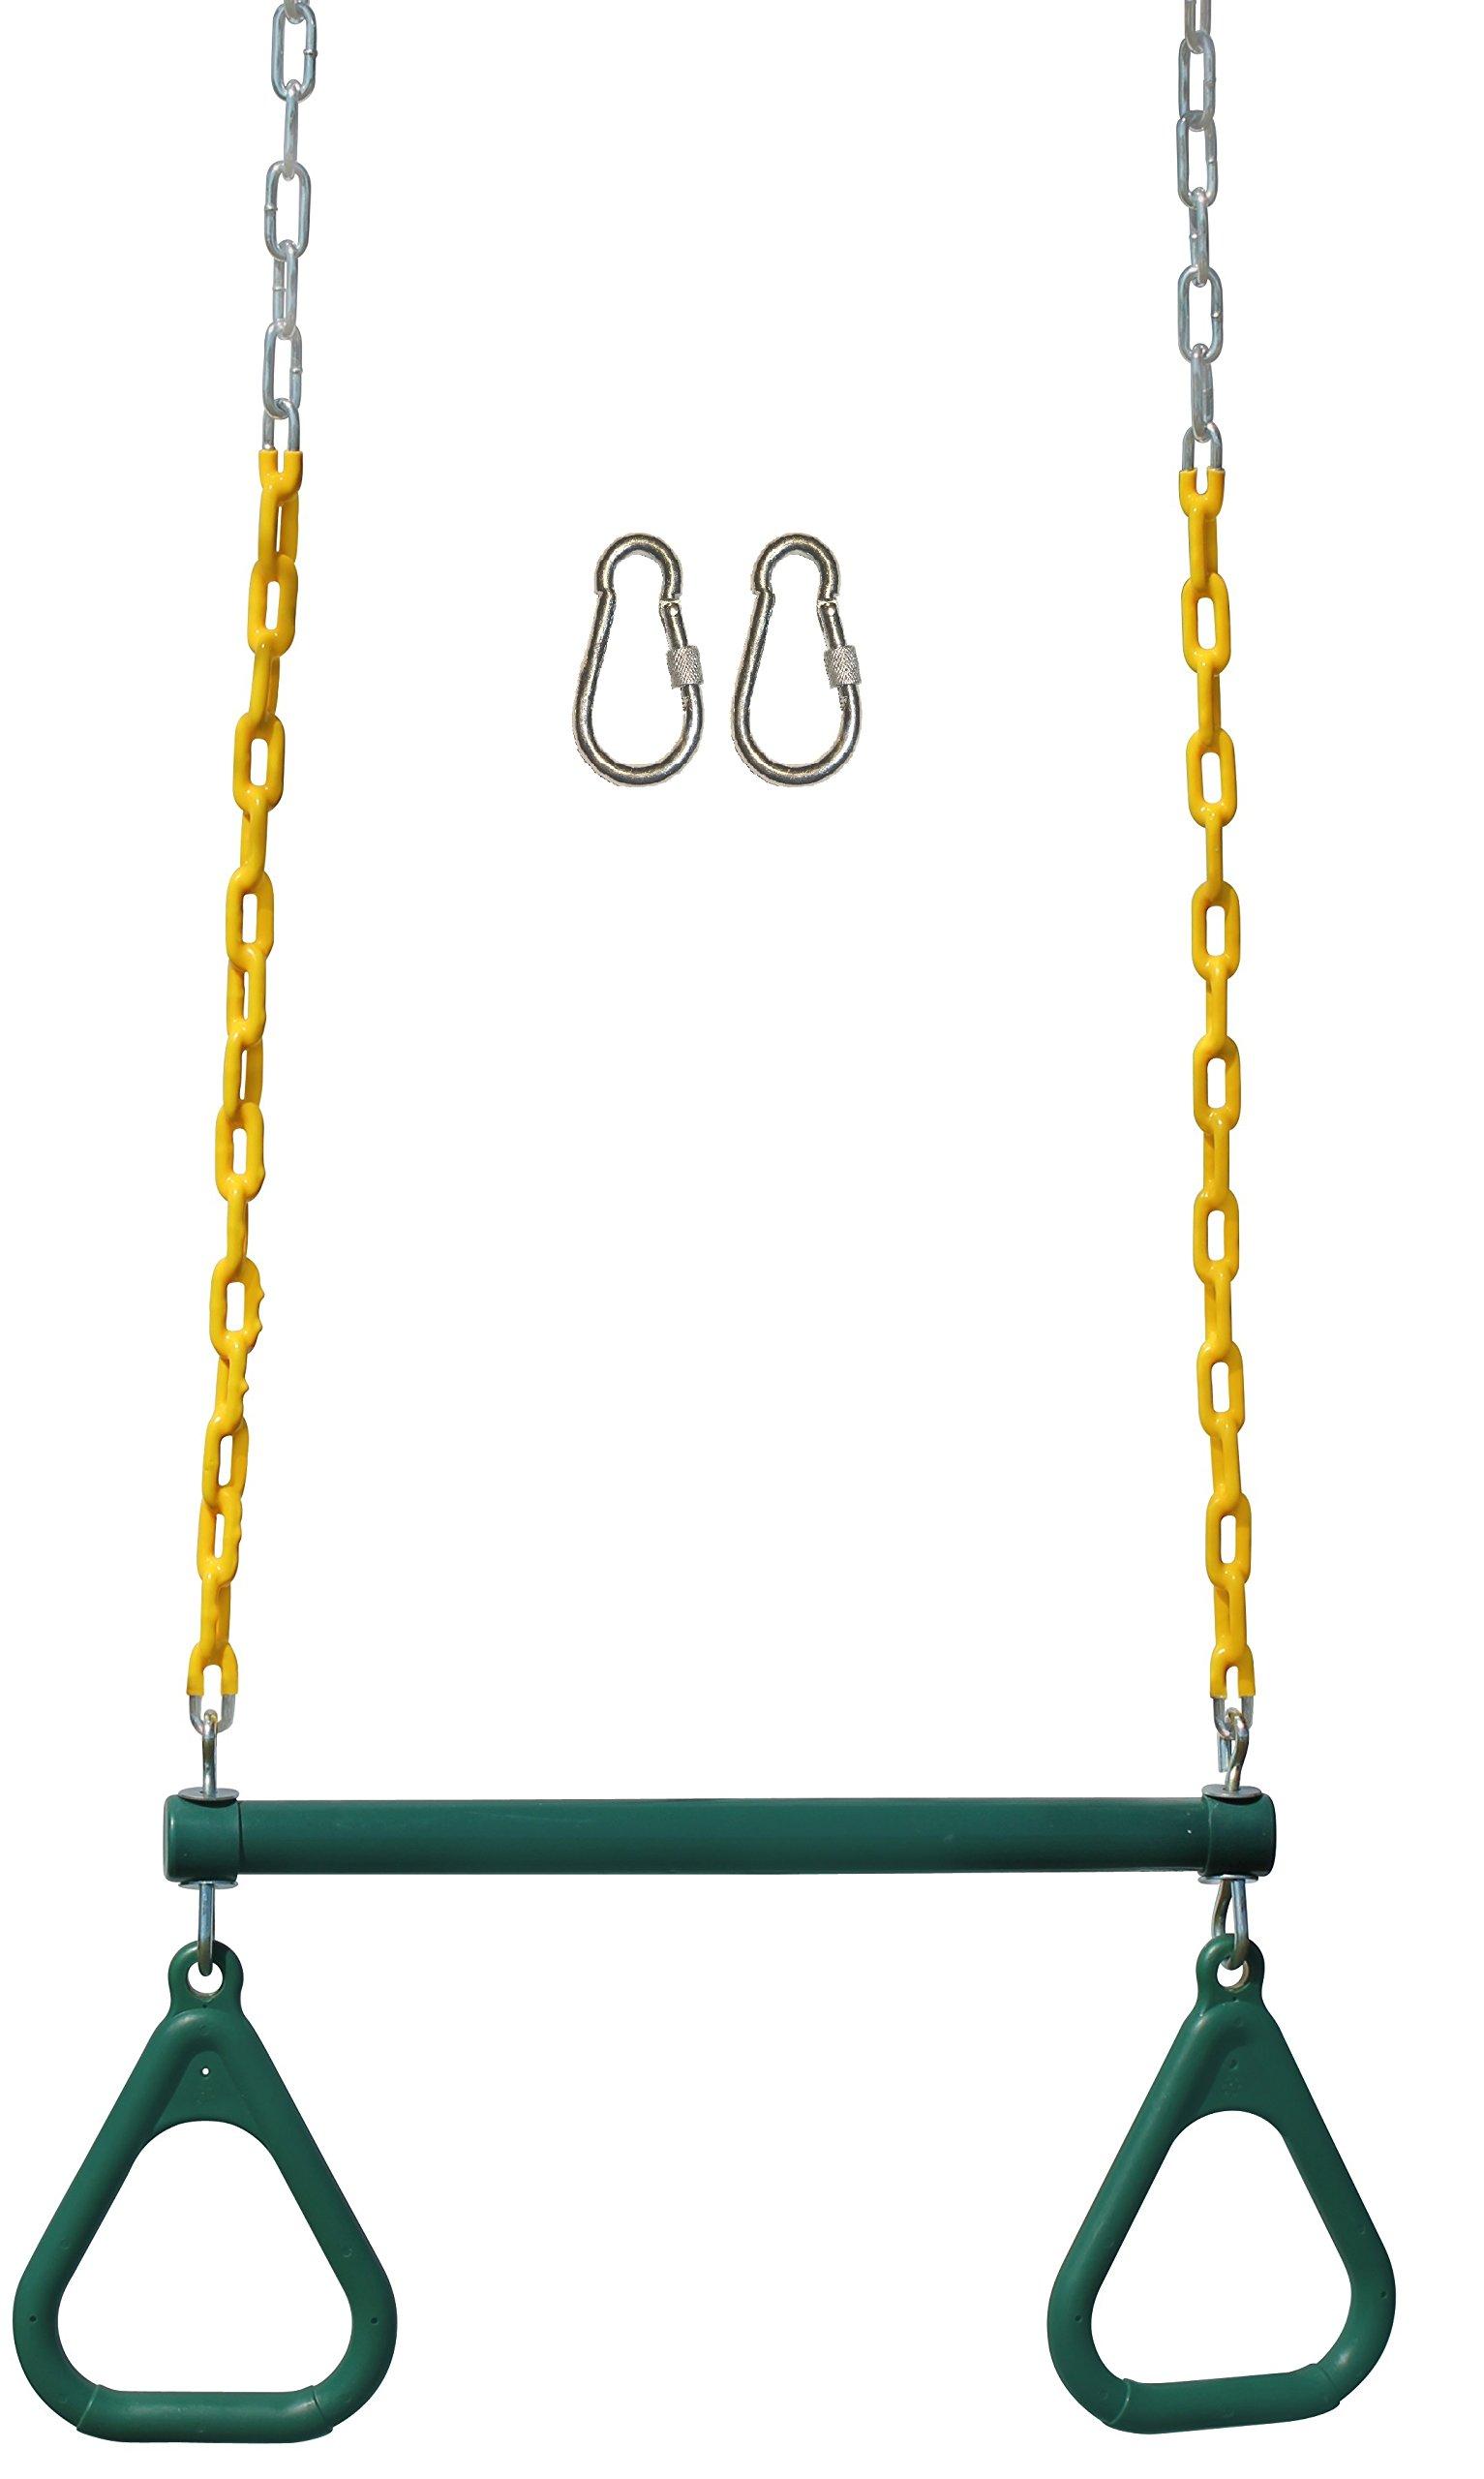 Jungle Gym Kingdom Accessories Carabiners